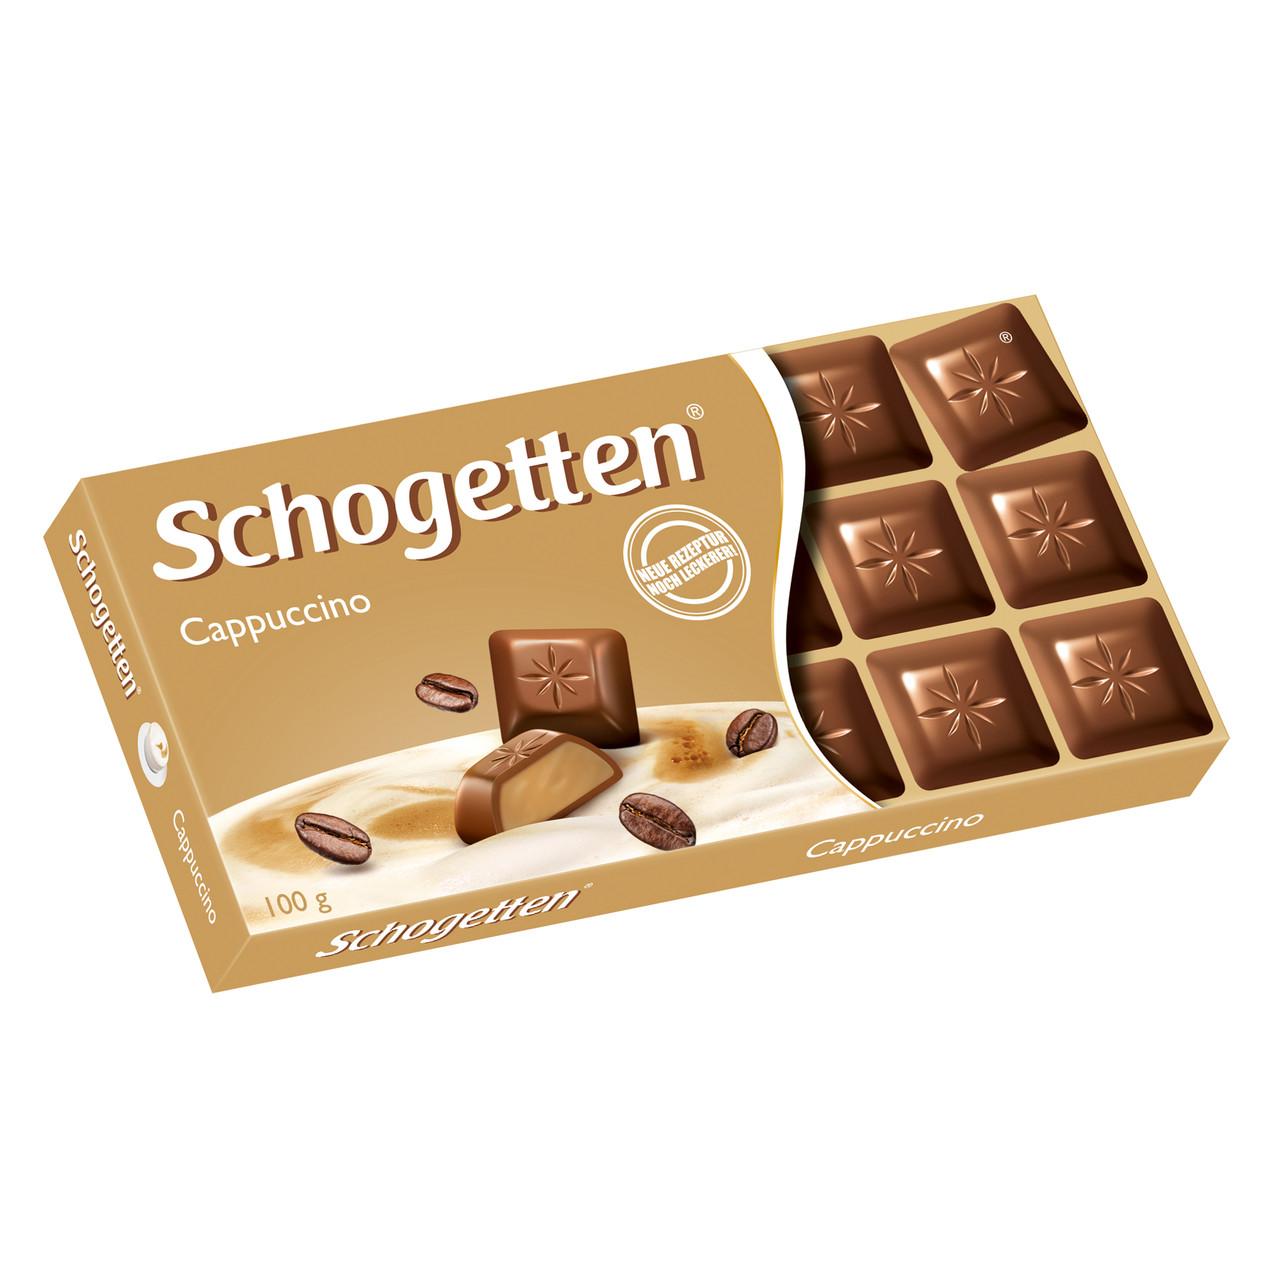 Шоколад Schogetten Cappuccino 100 гр.